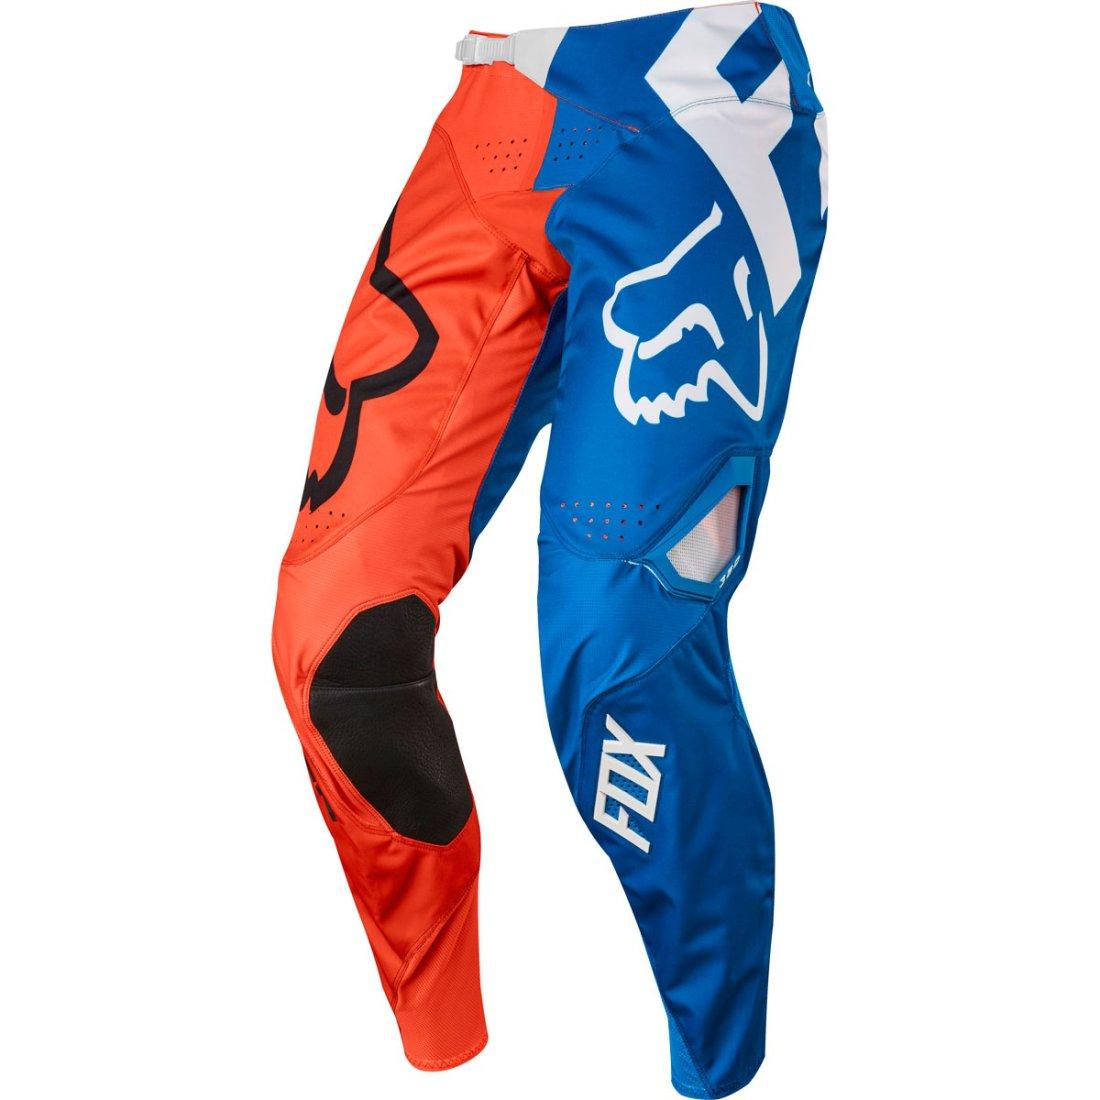 98 Pantalones de motocross 19f6c457792